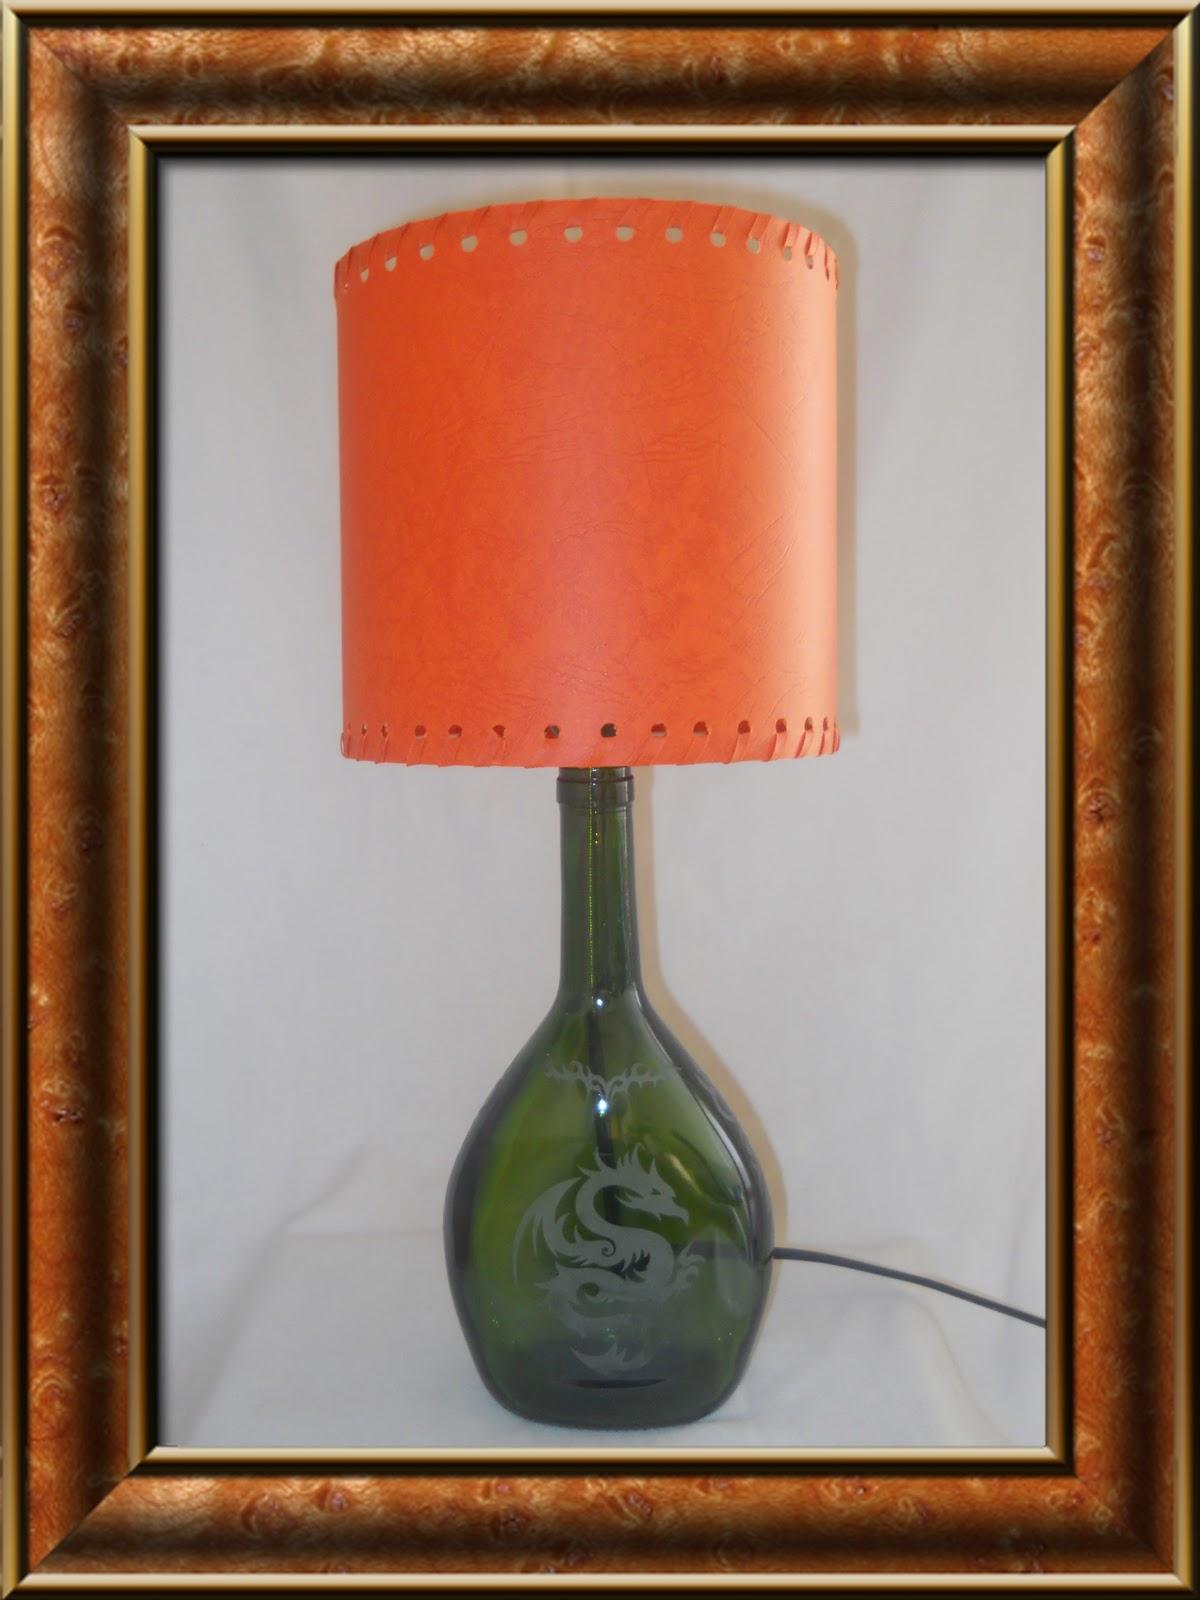 Arte con botellas de vidrio lamparas de mesa - Lamparas con botes de cristal ...